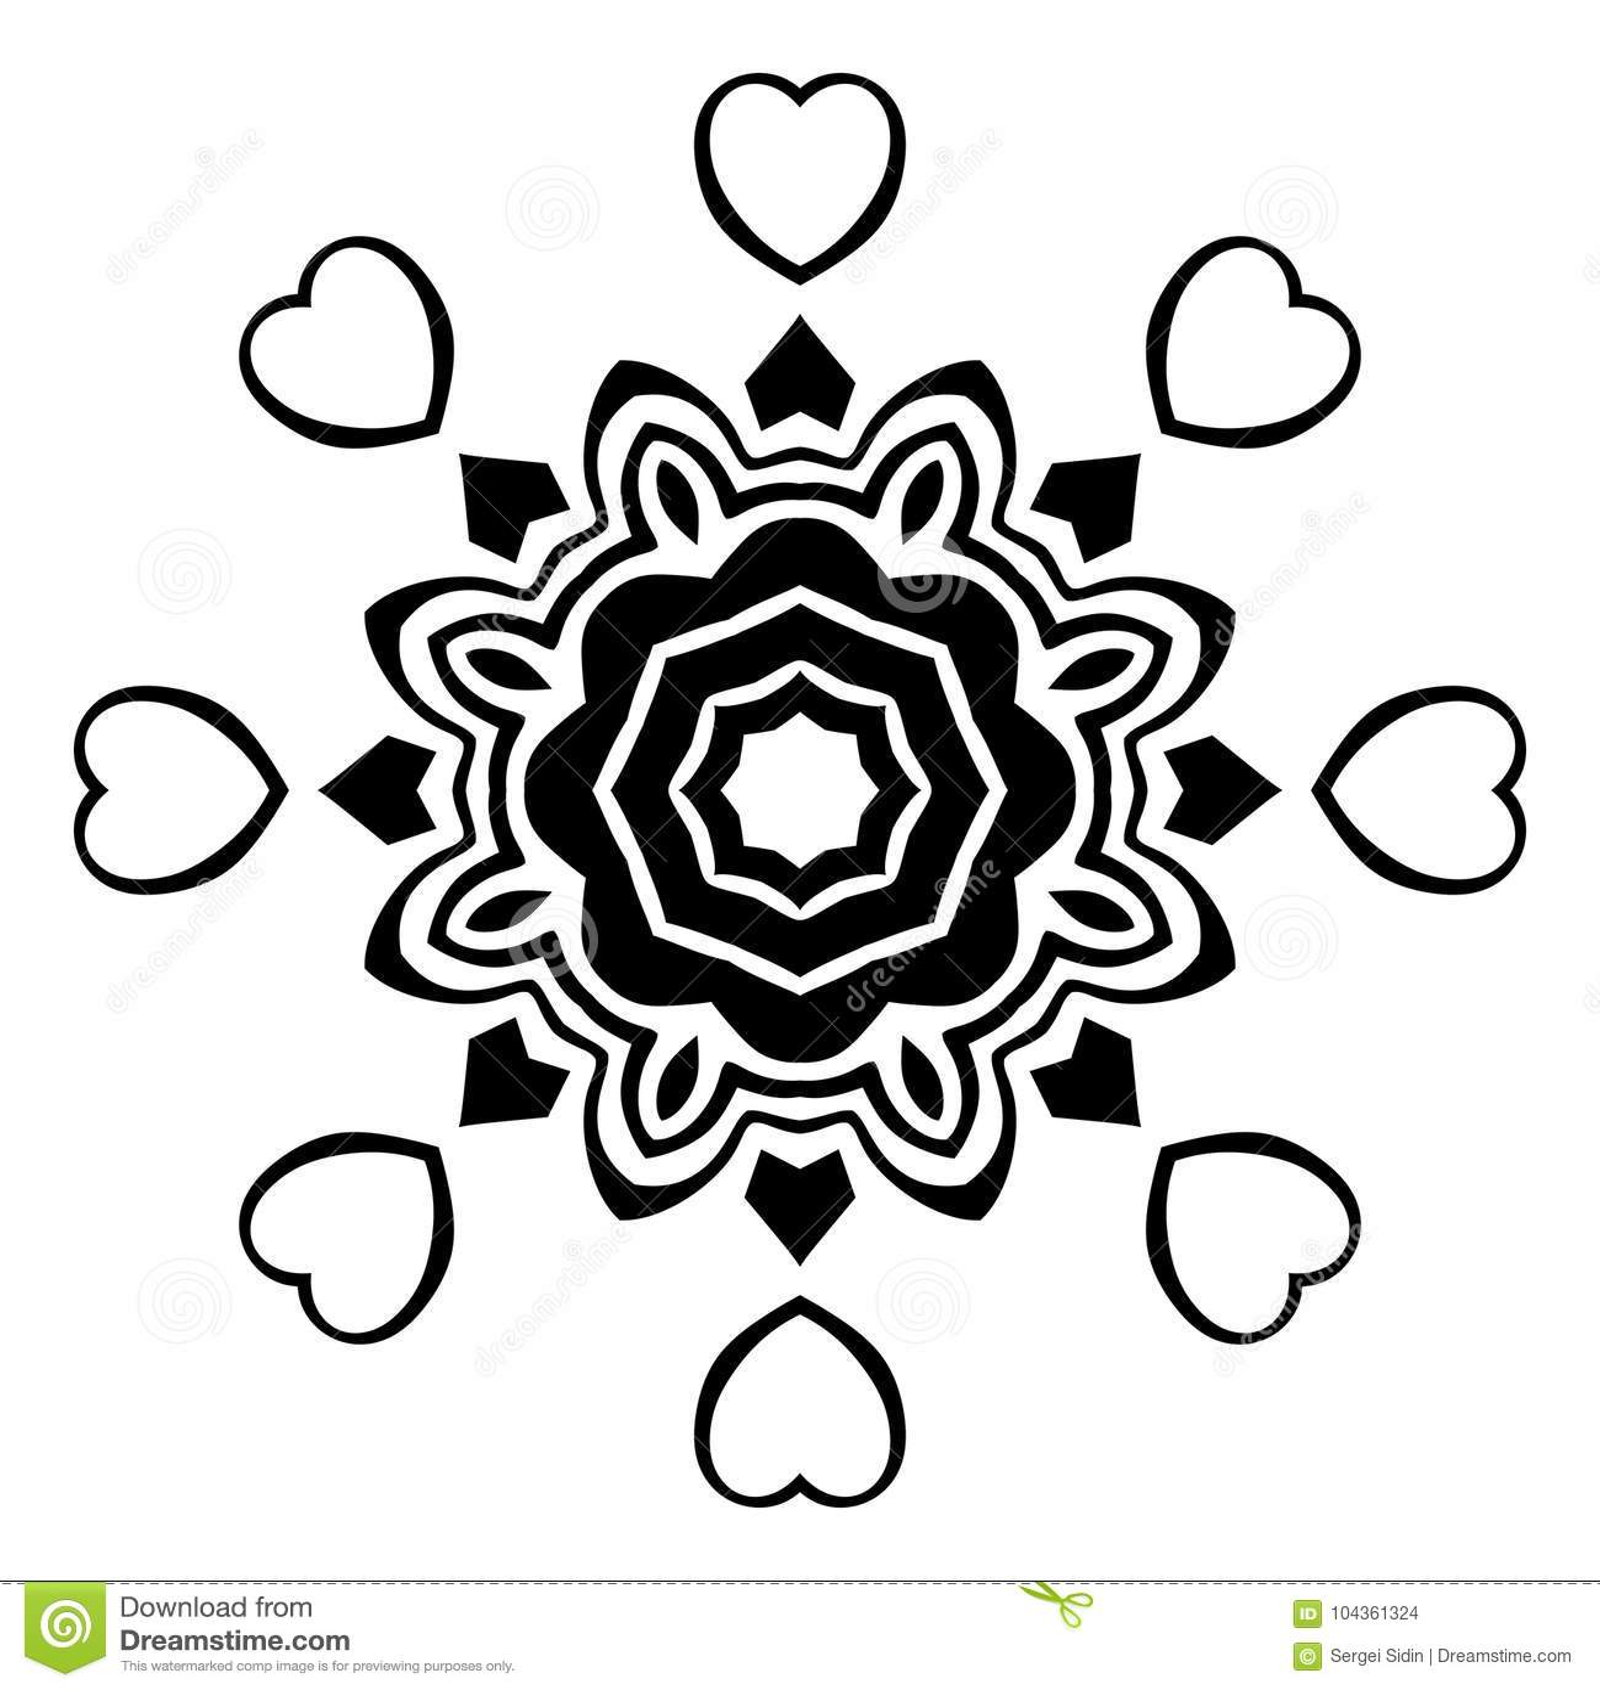 Creative Ornament Design Black And White Mandala Hand Drawn